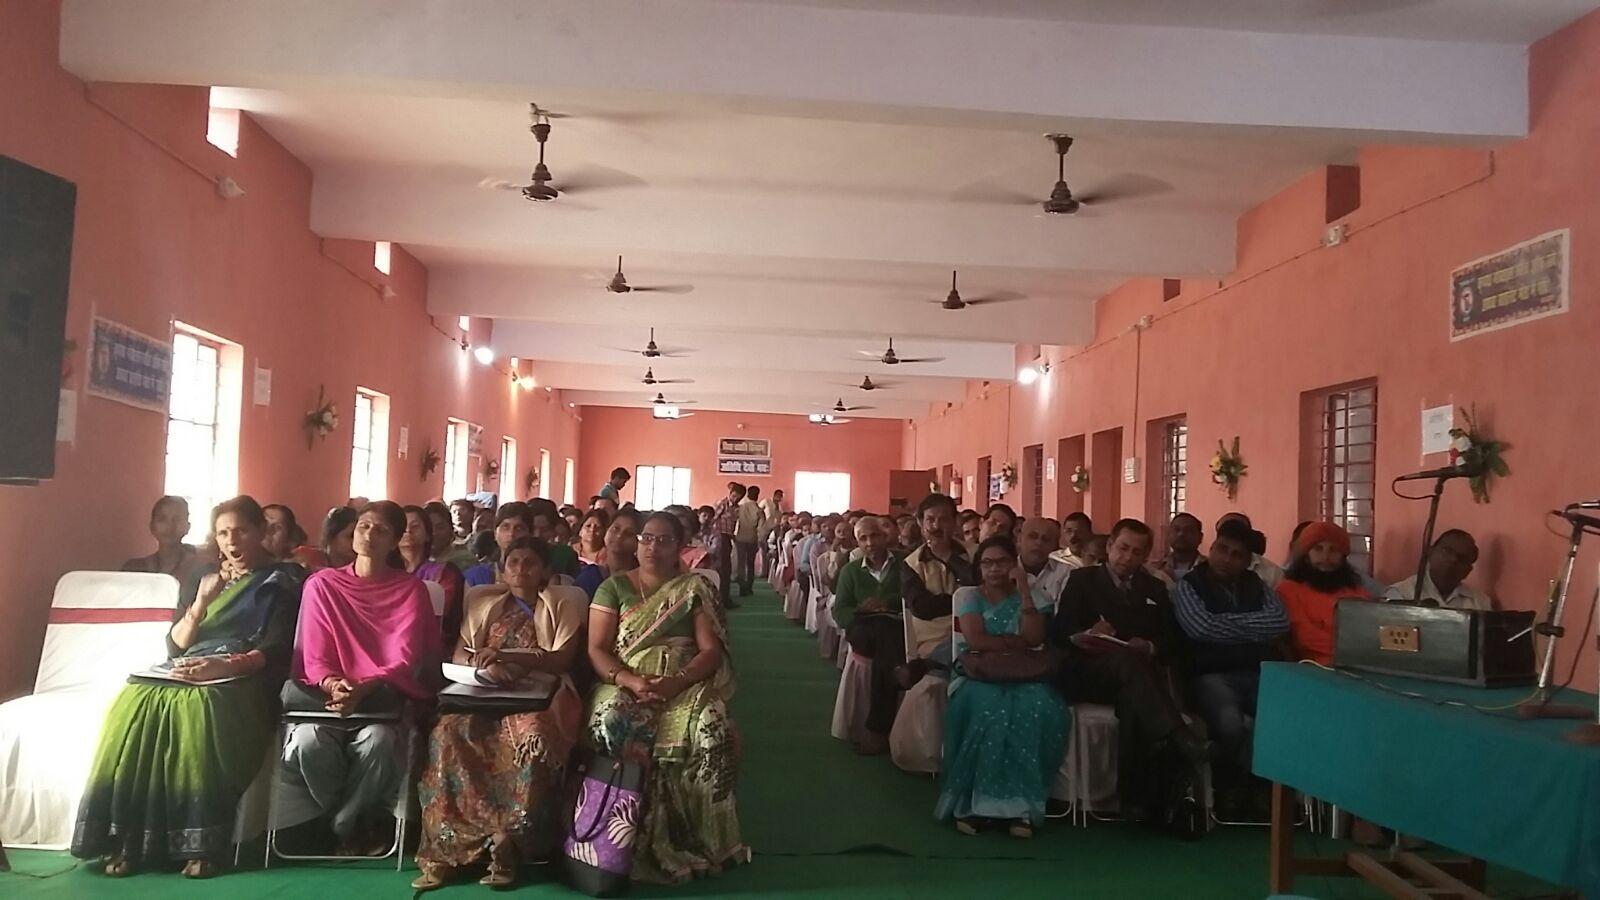 Research Scholars, Teachers & Audience present in the Seminar Hall of Madhepura College Madhepura .